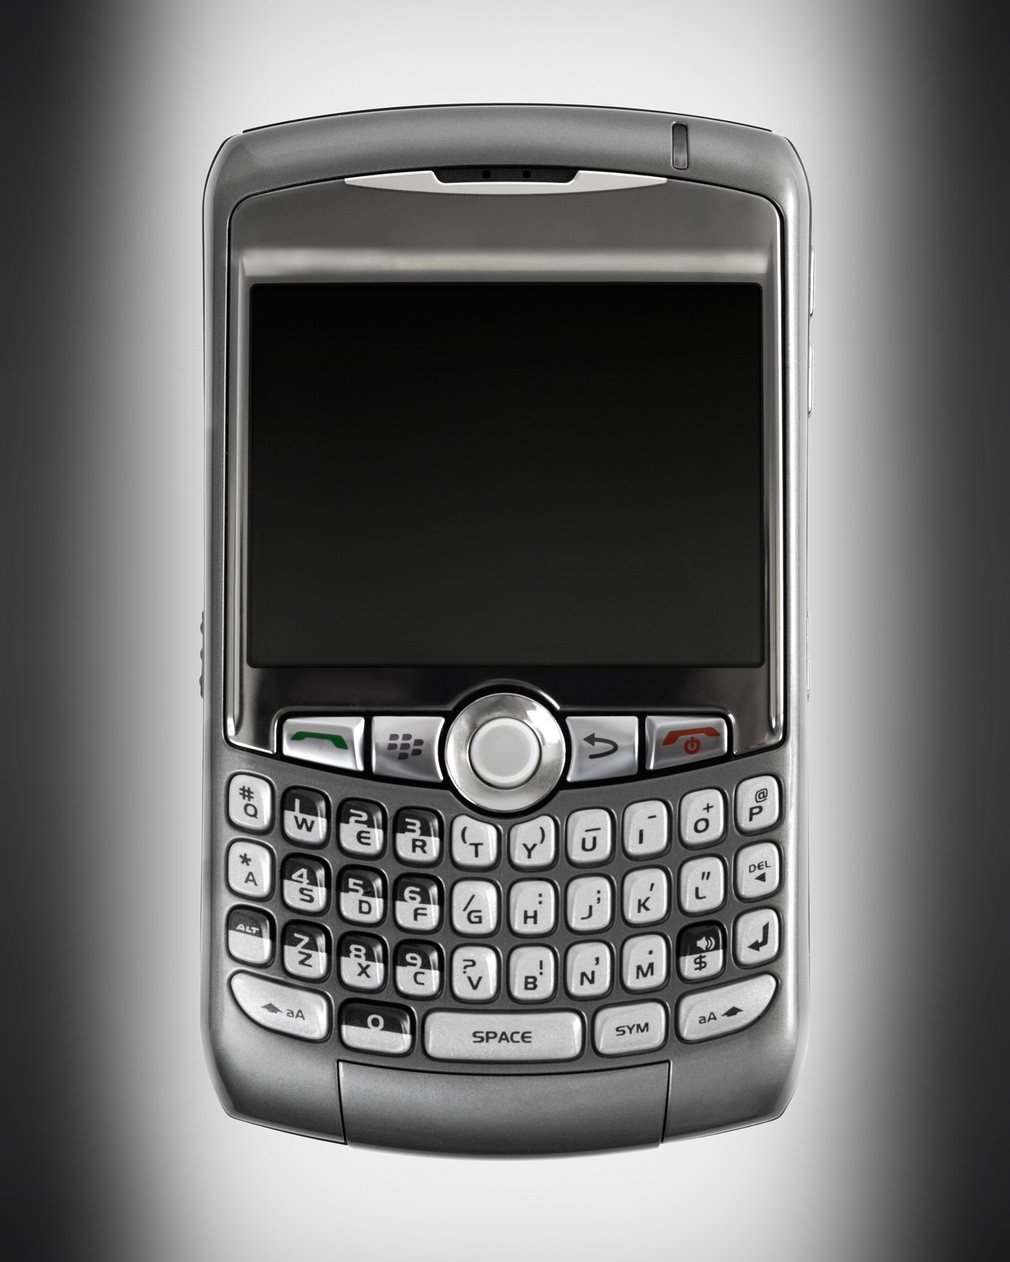 blackberry_curve.jpg